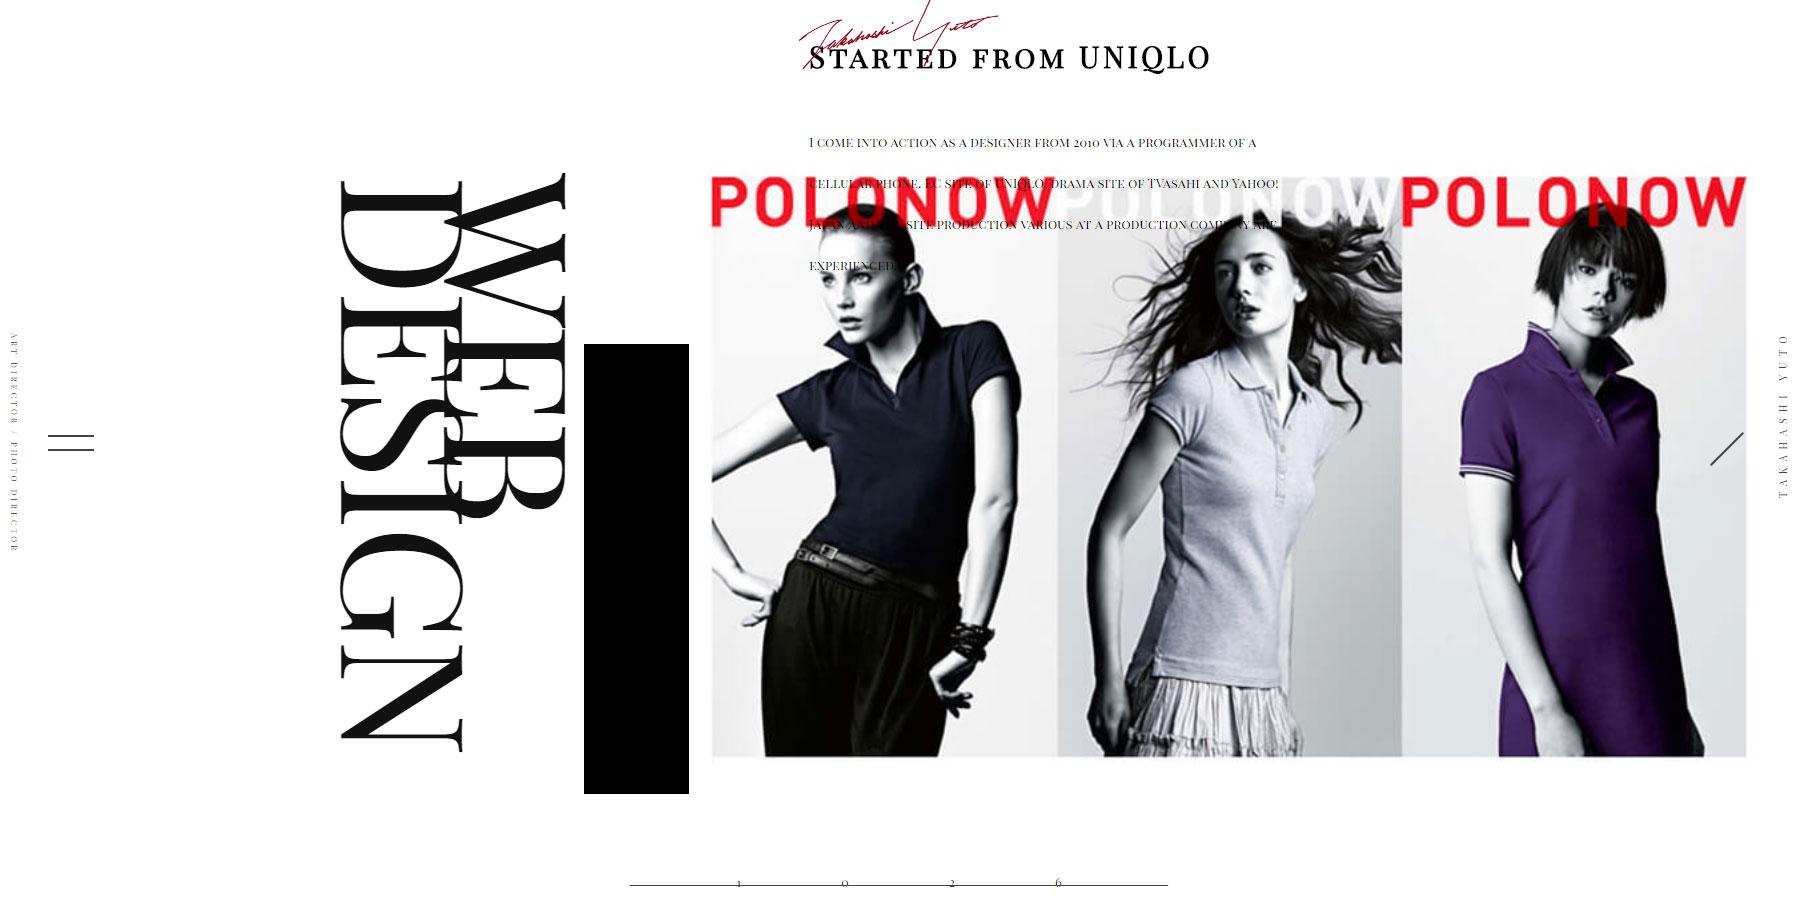 Yuto Takahashi - Designer - Website of the Day